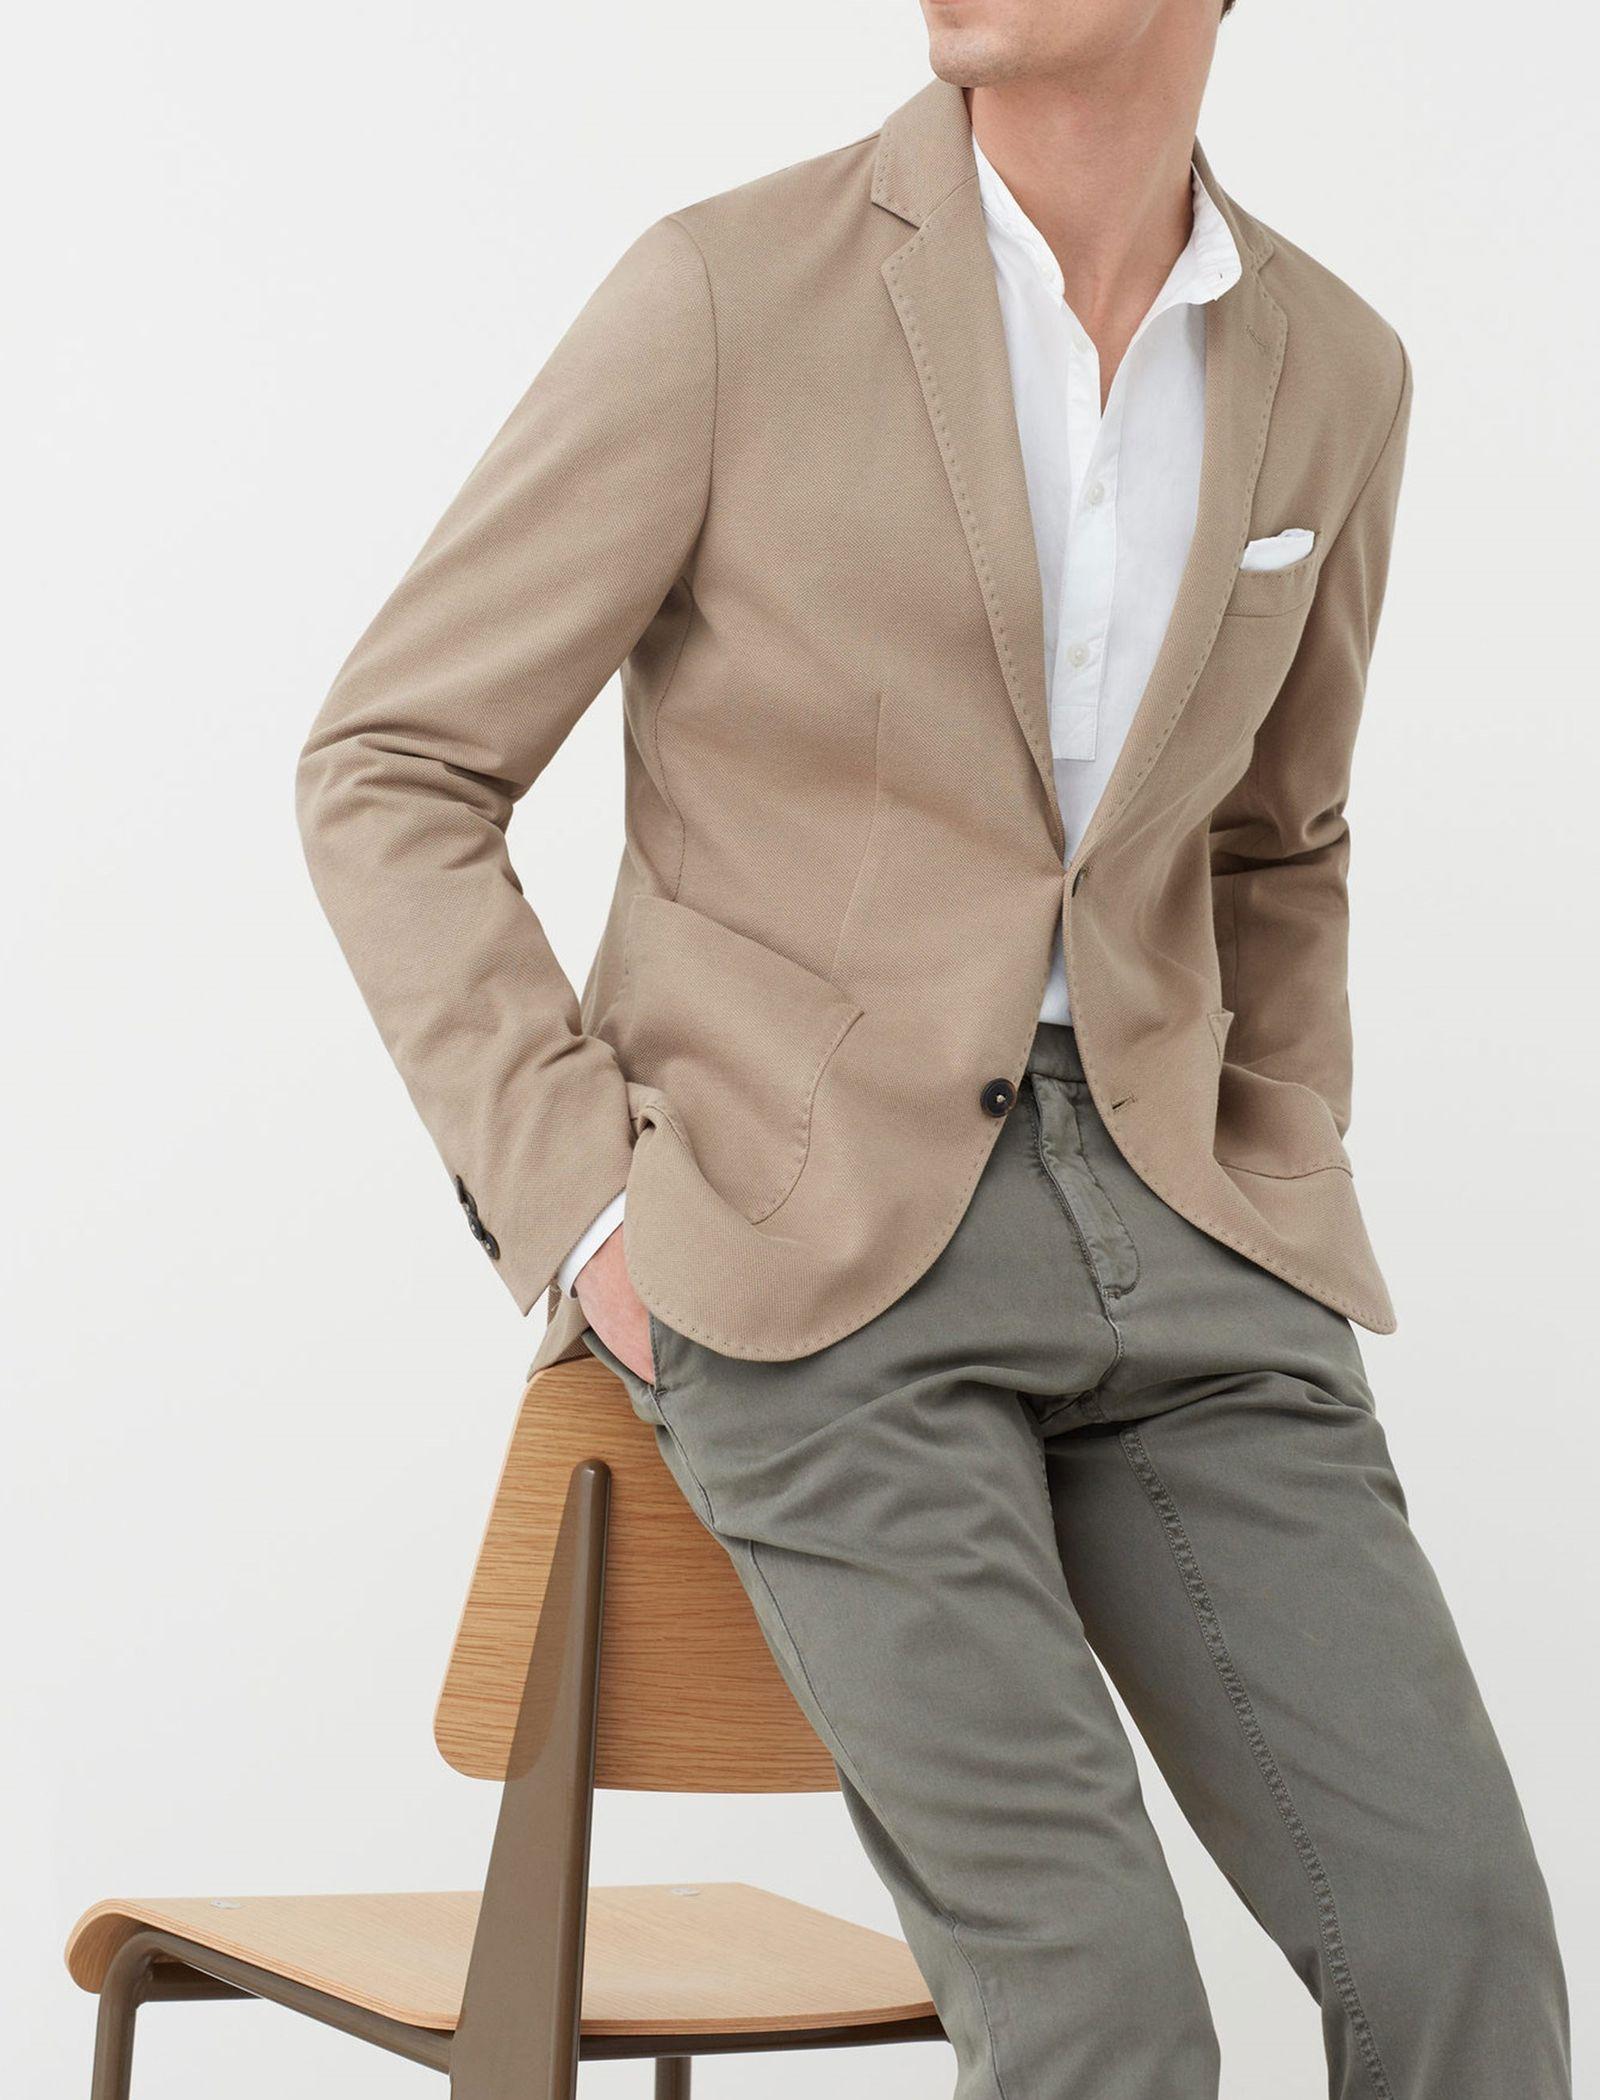 کت تک نخی مردانه - مانگو - بژ روشن - 4